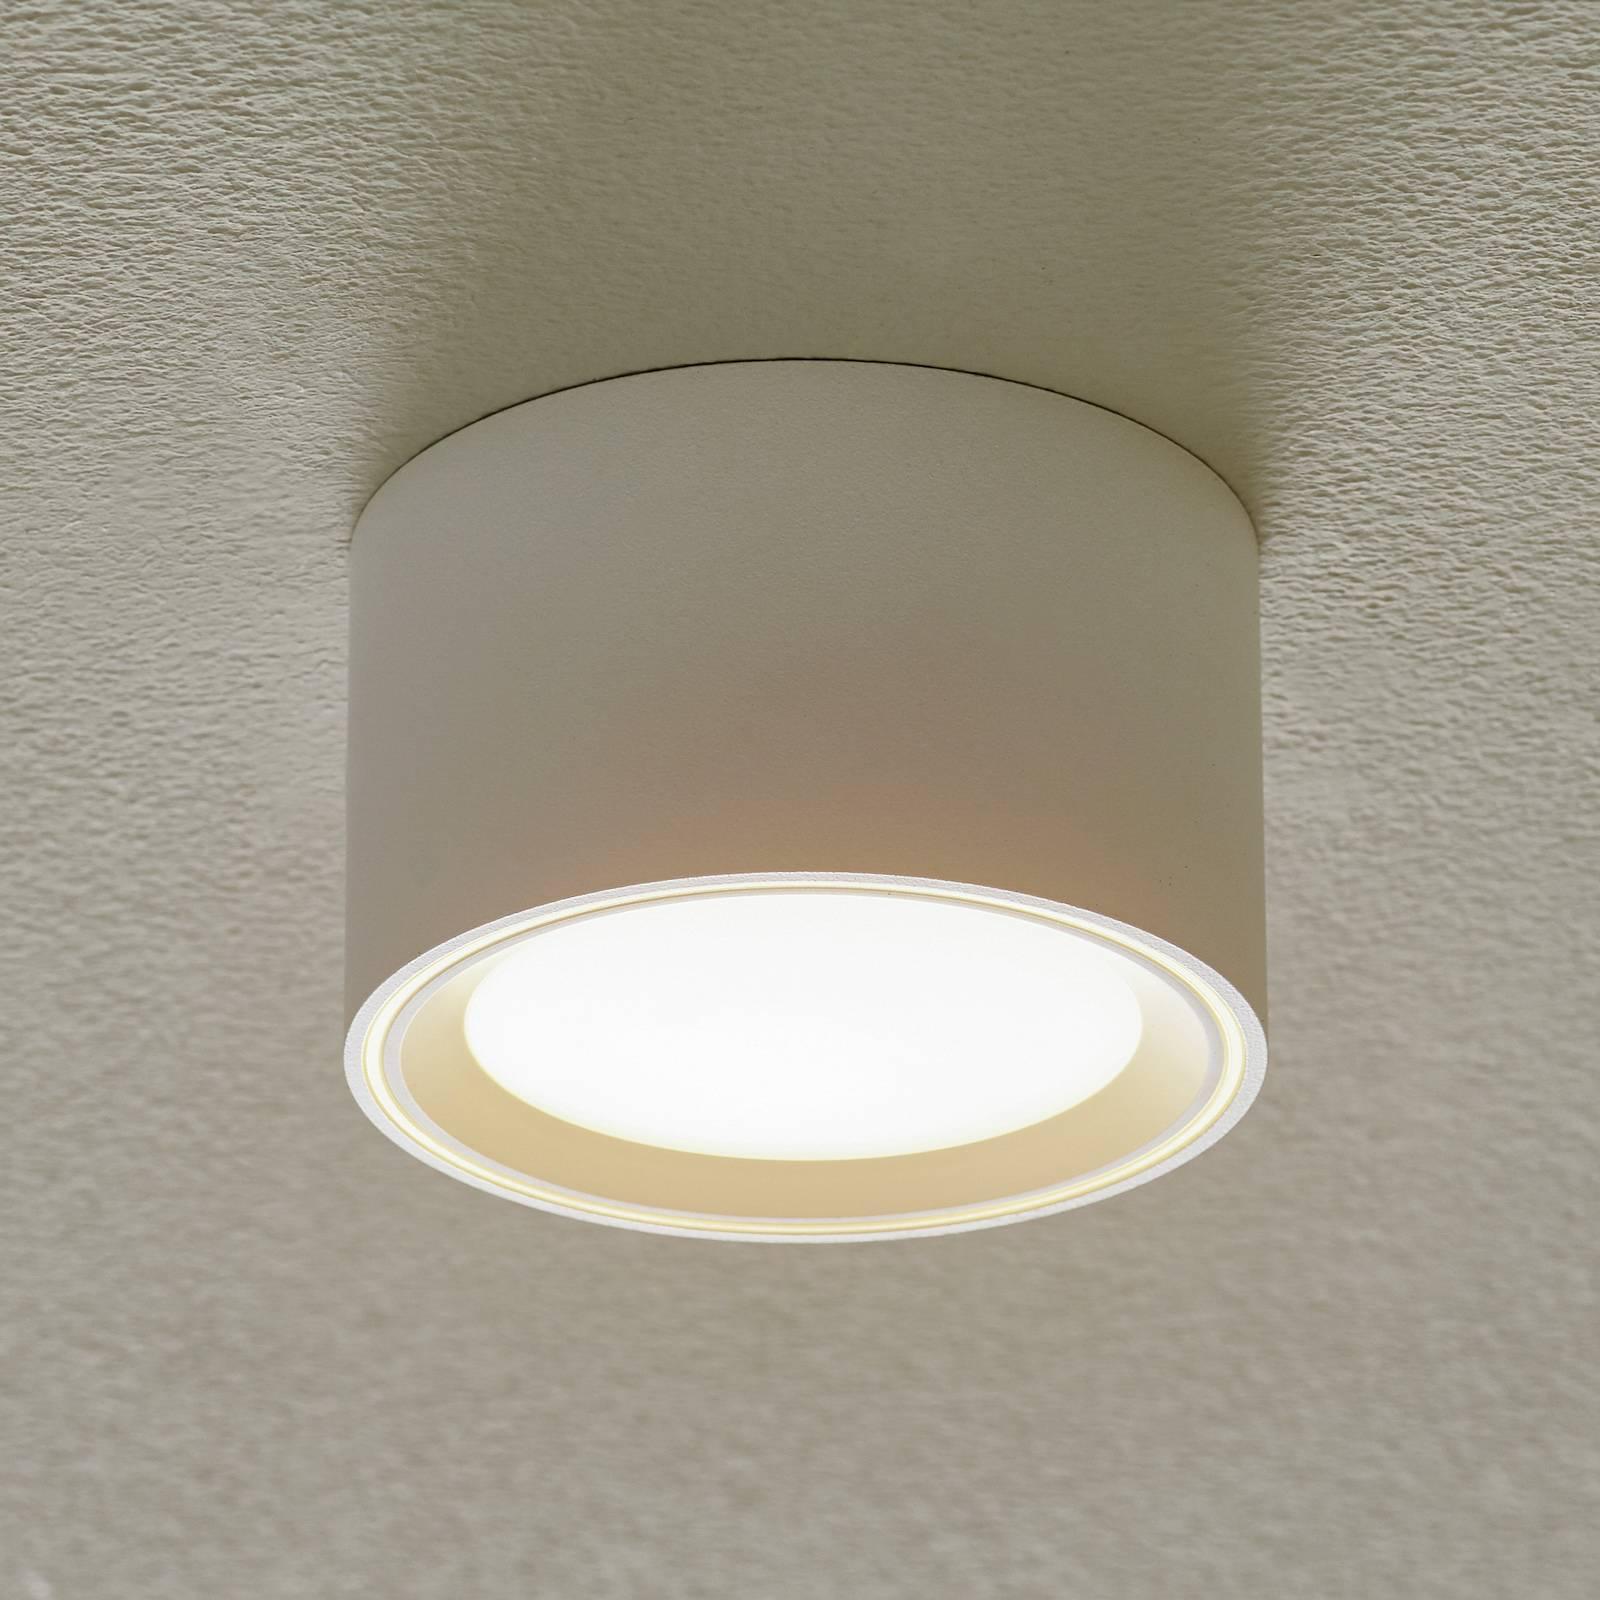 Fallon-LED-kattovalaisin, korkeus 6 cm